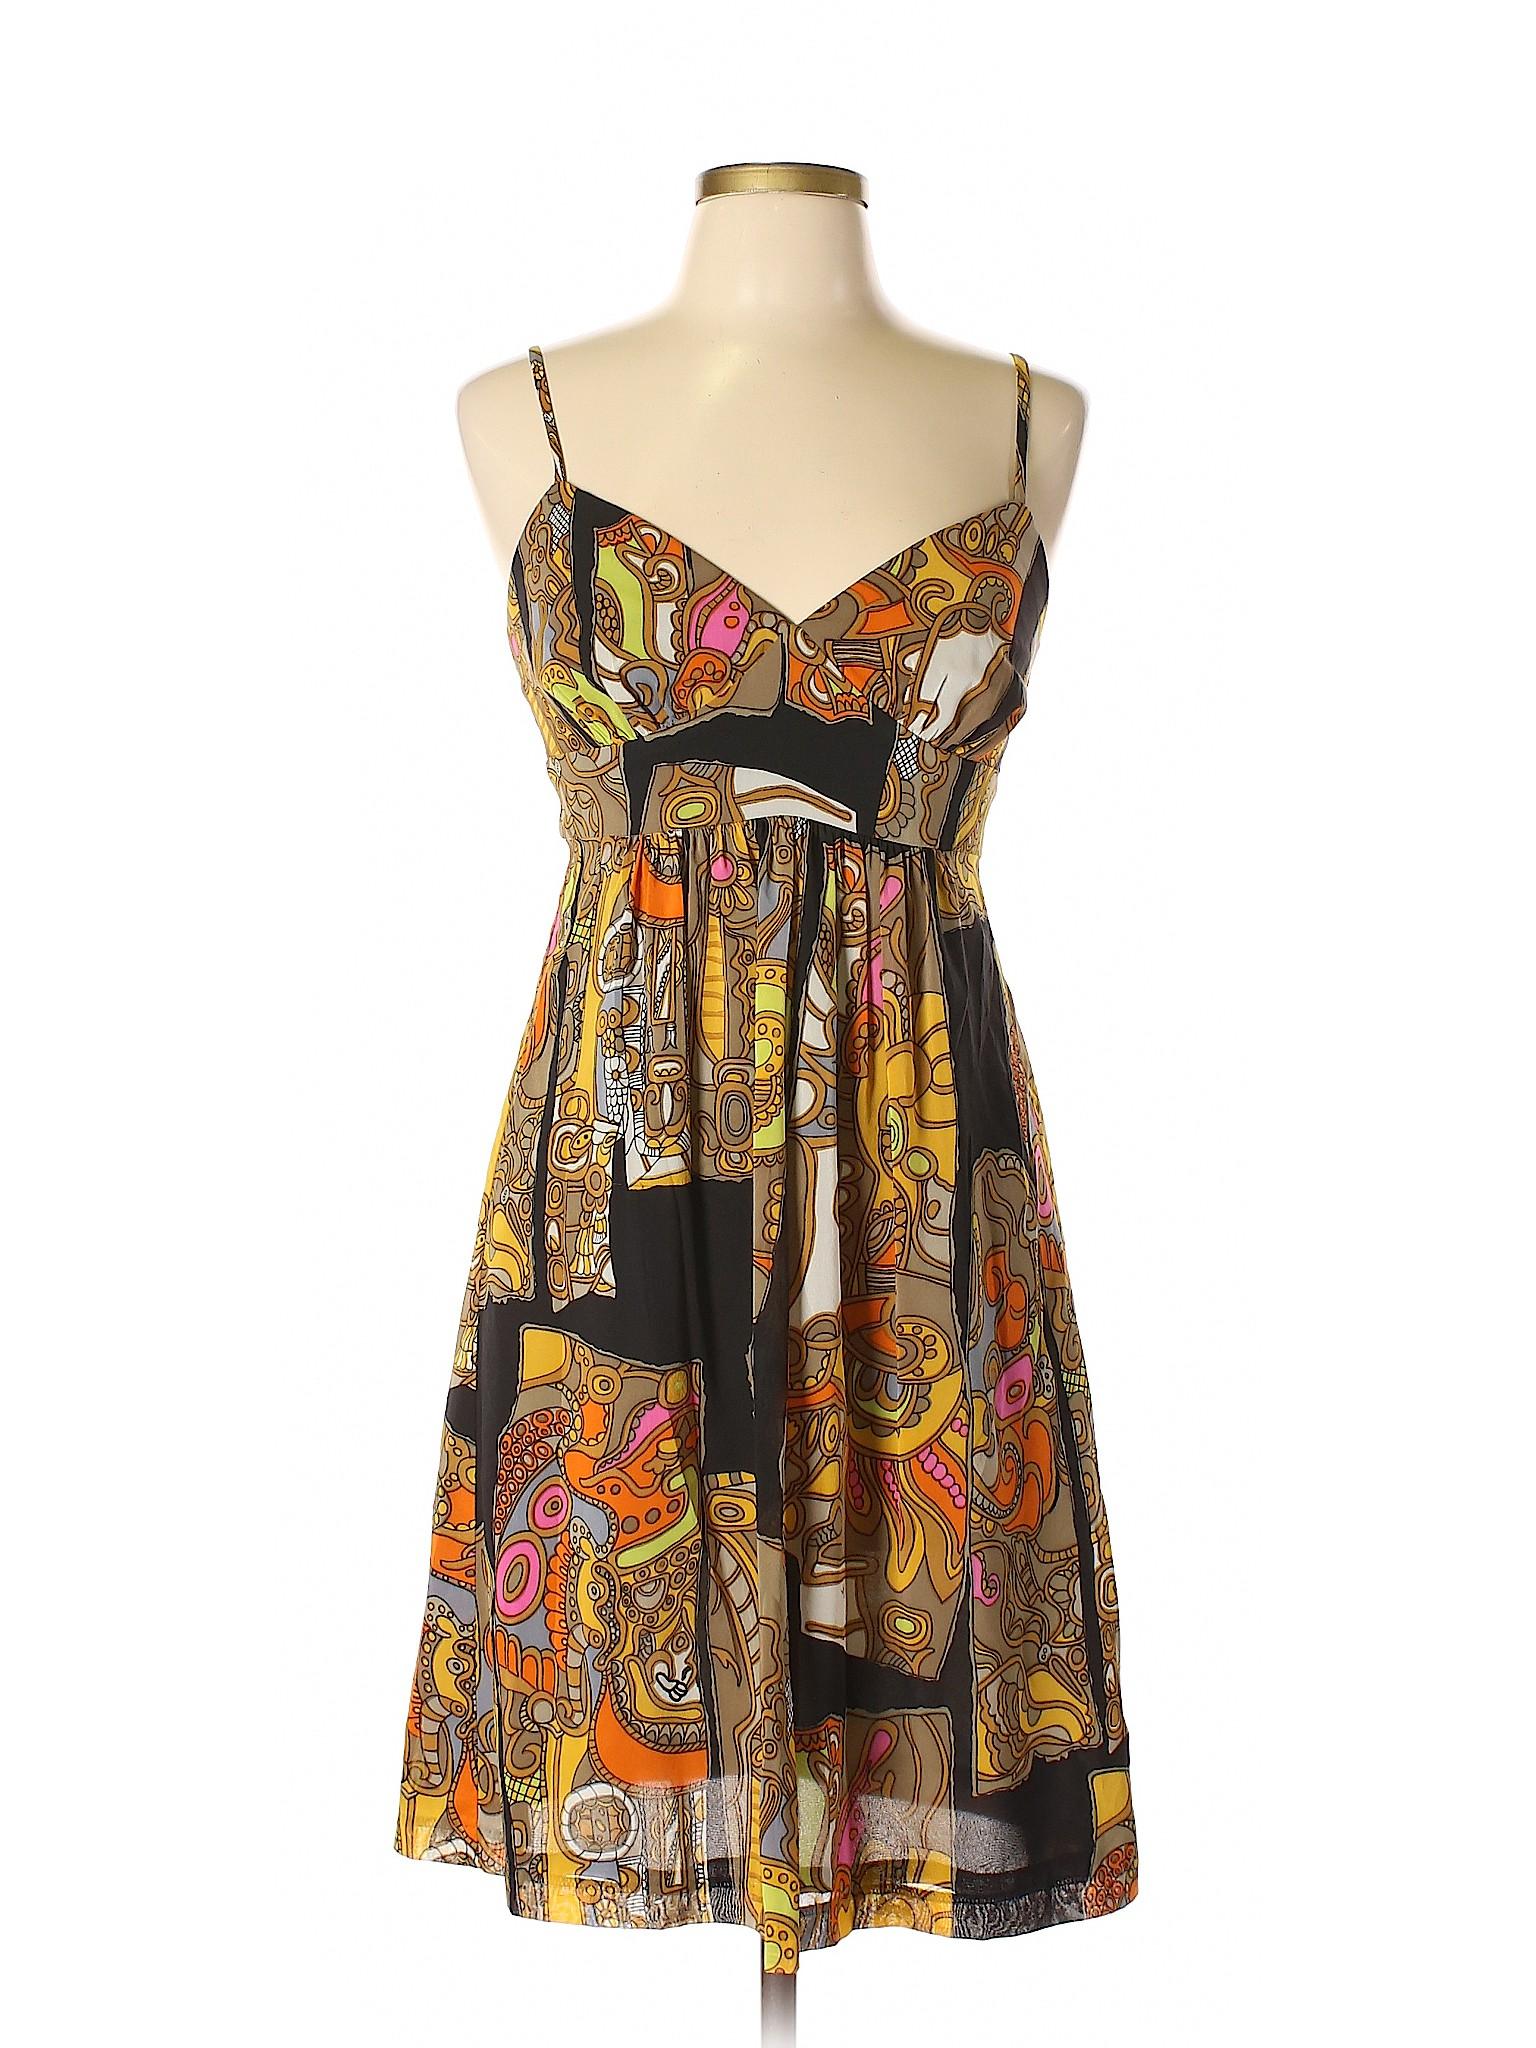 Trina Casual winter Turk Dress Boutique FwaU7z